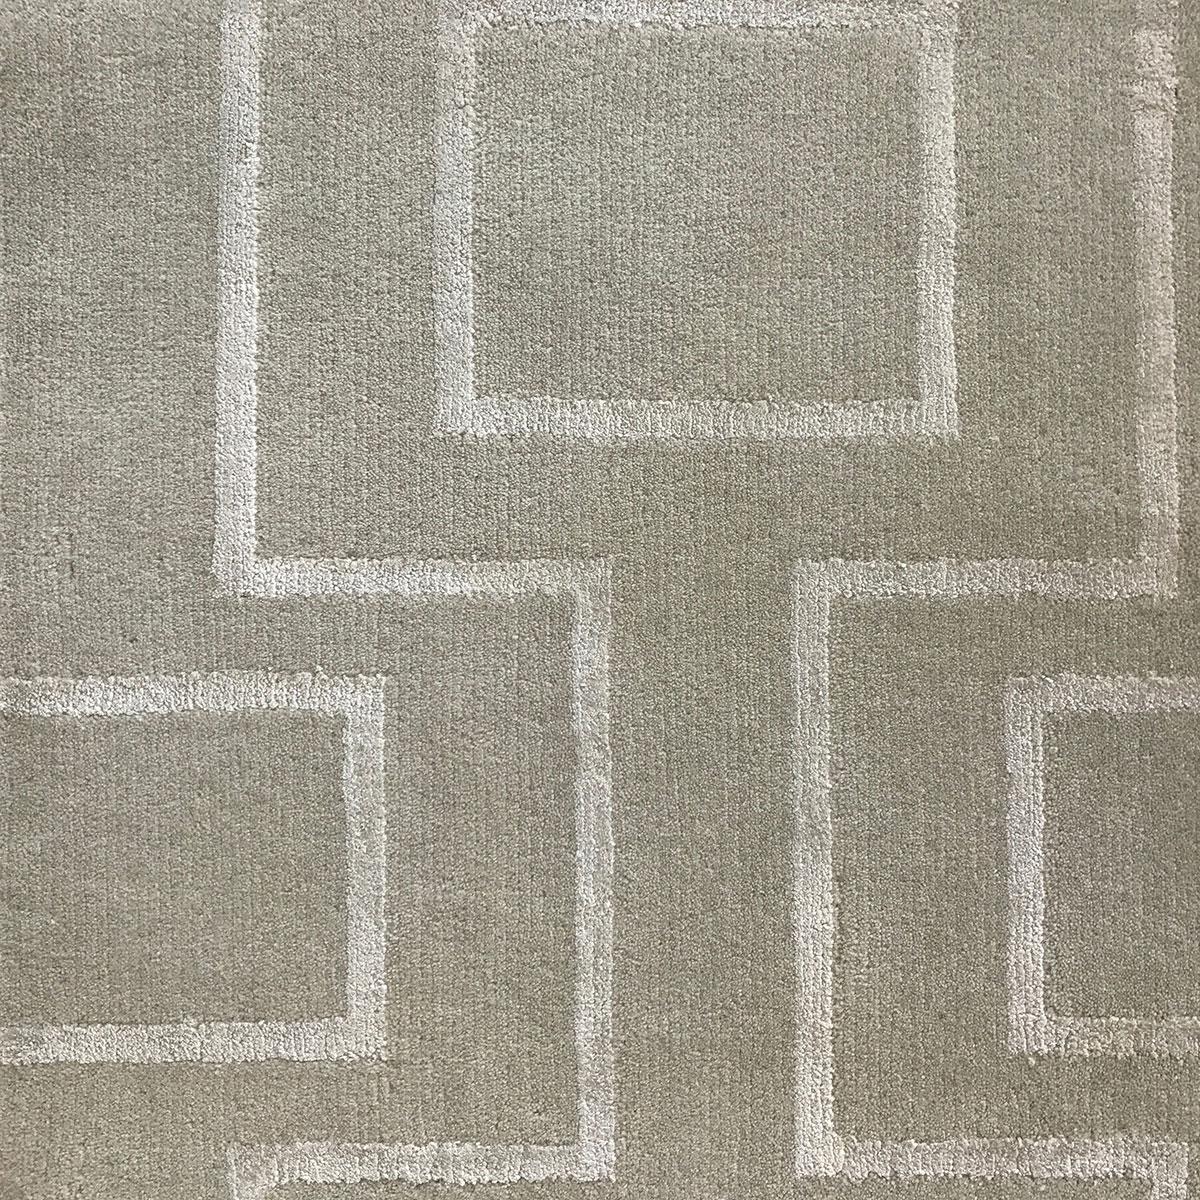 lhasa-rhombus-downy-custom-area-rug_thumb.jpg